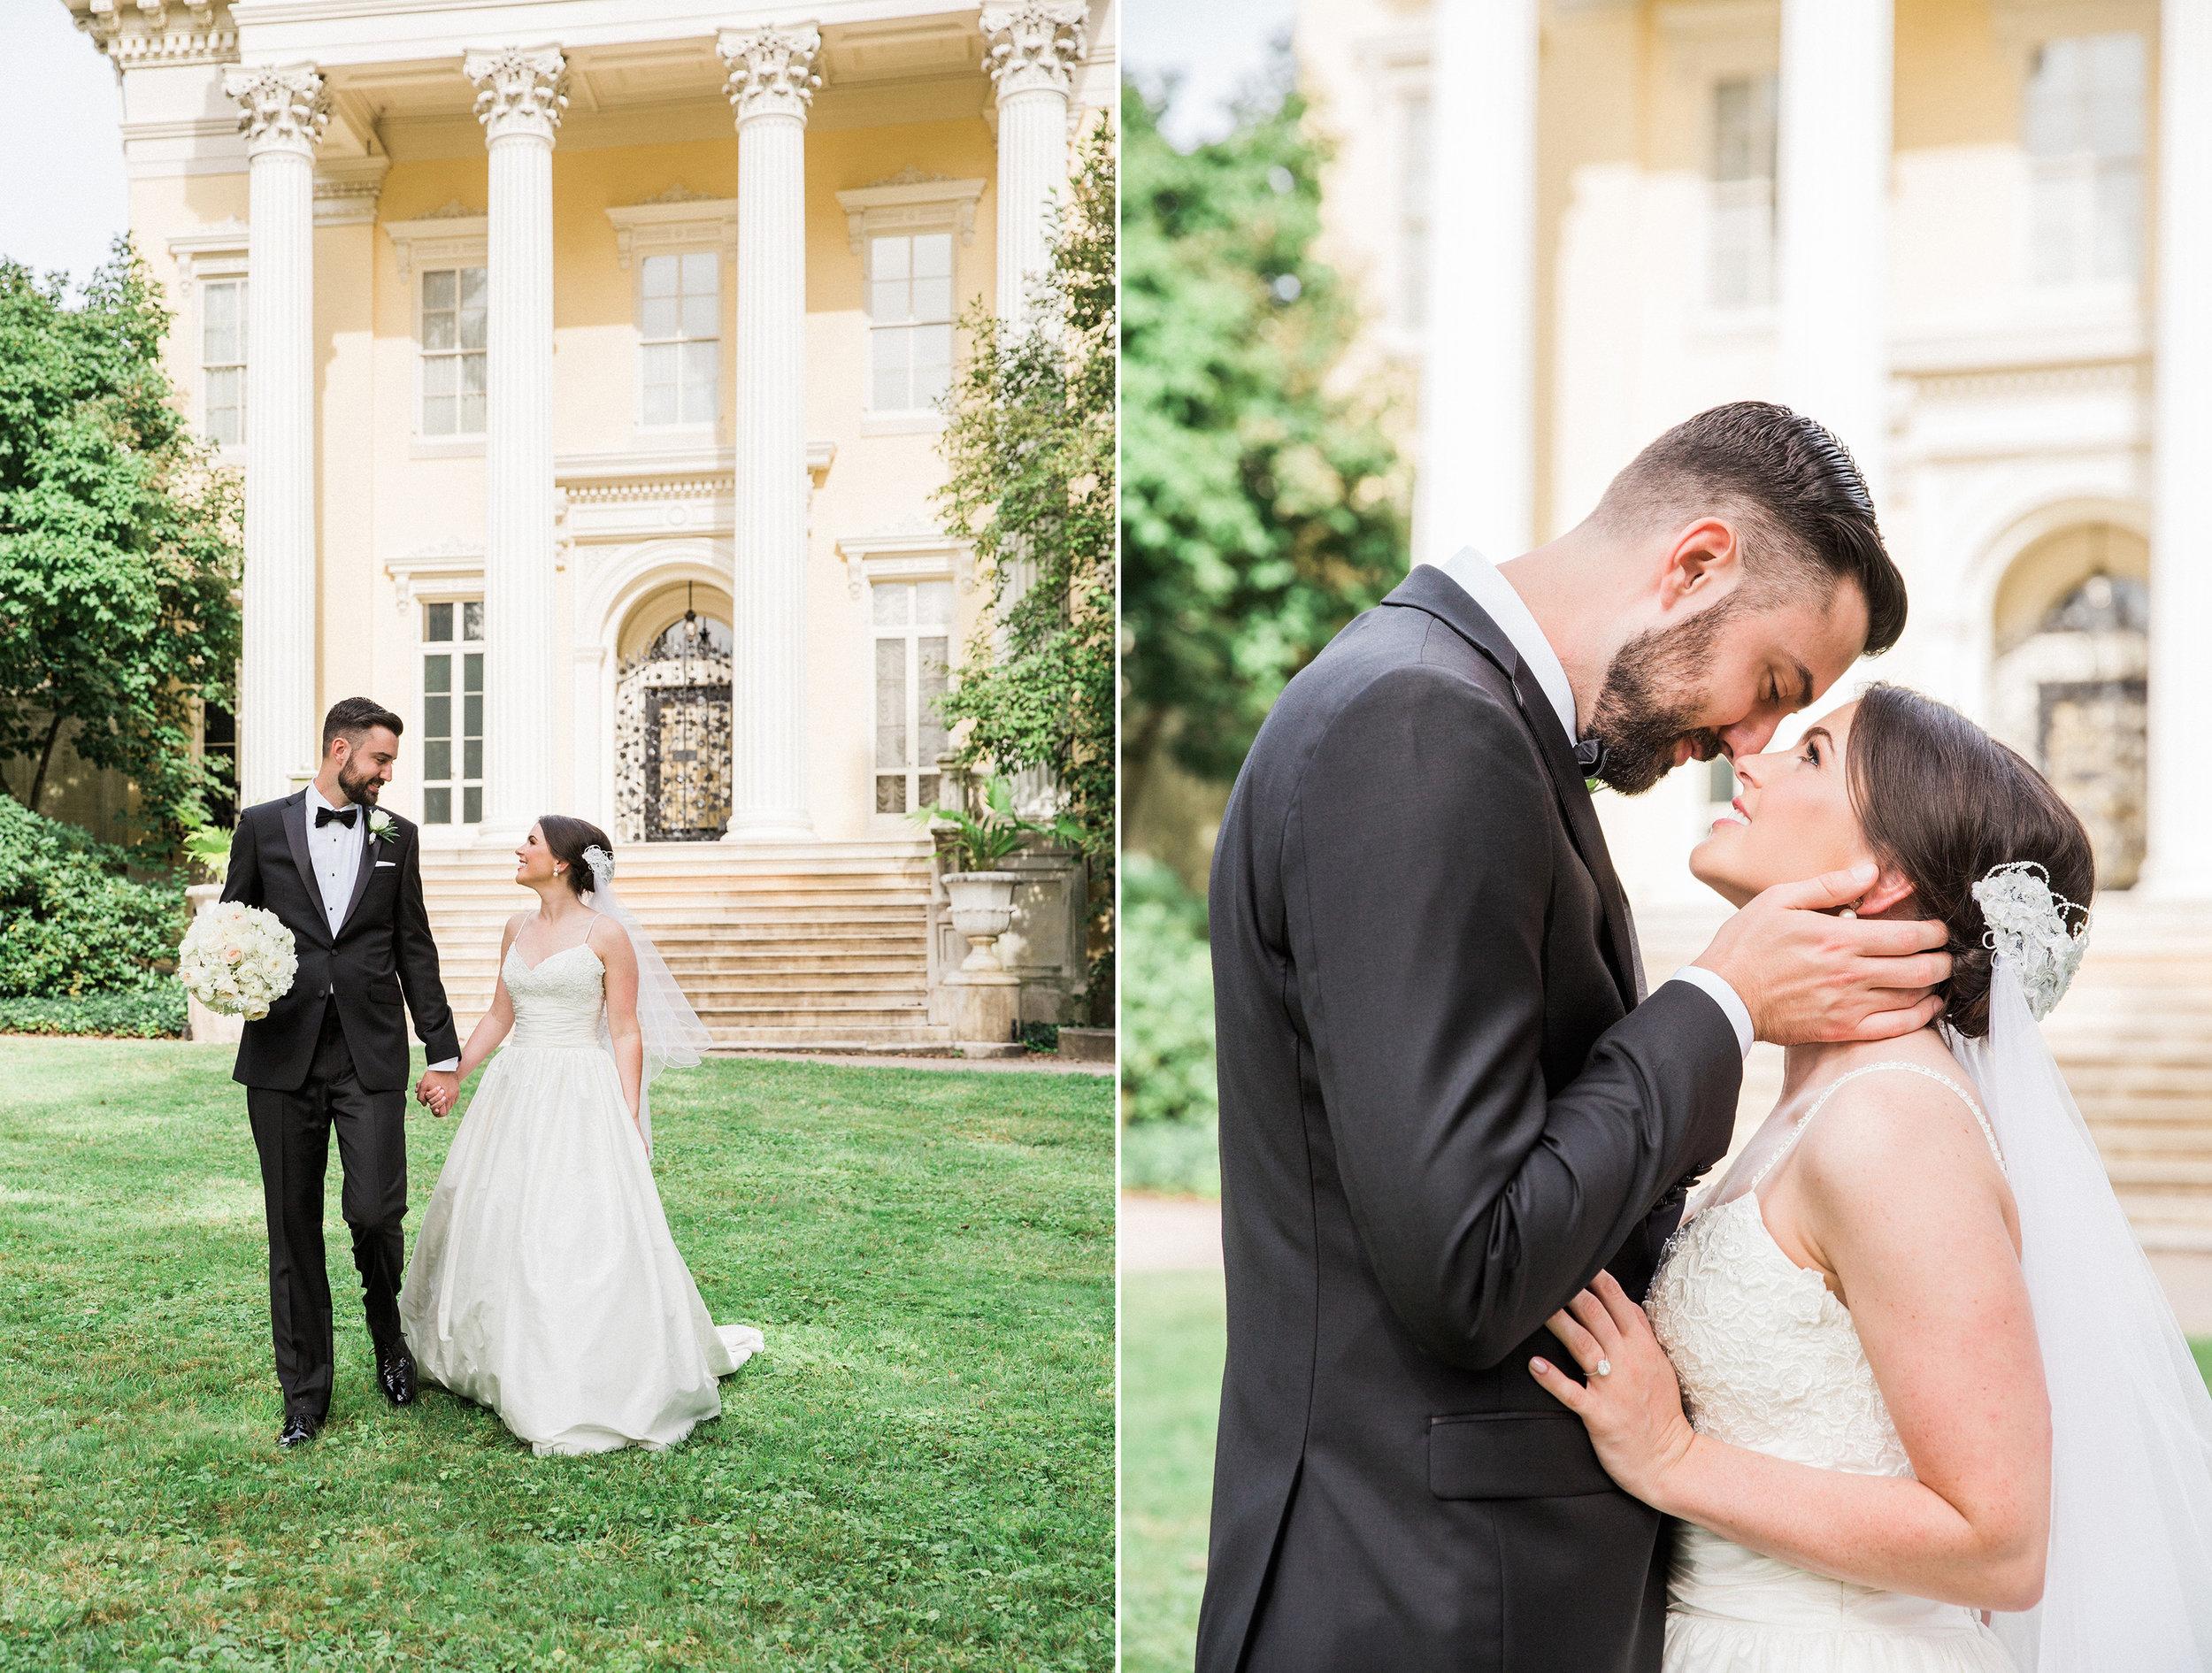 Evergreen-Museum-Balitmore-Maryland-Wedding-Black-Tie-Bride-011.jpg